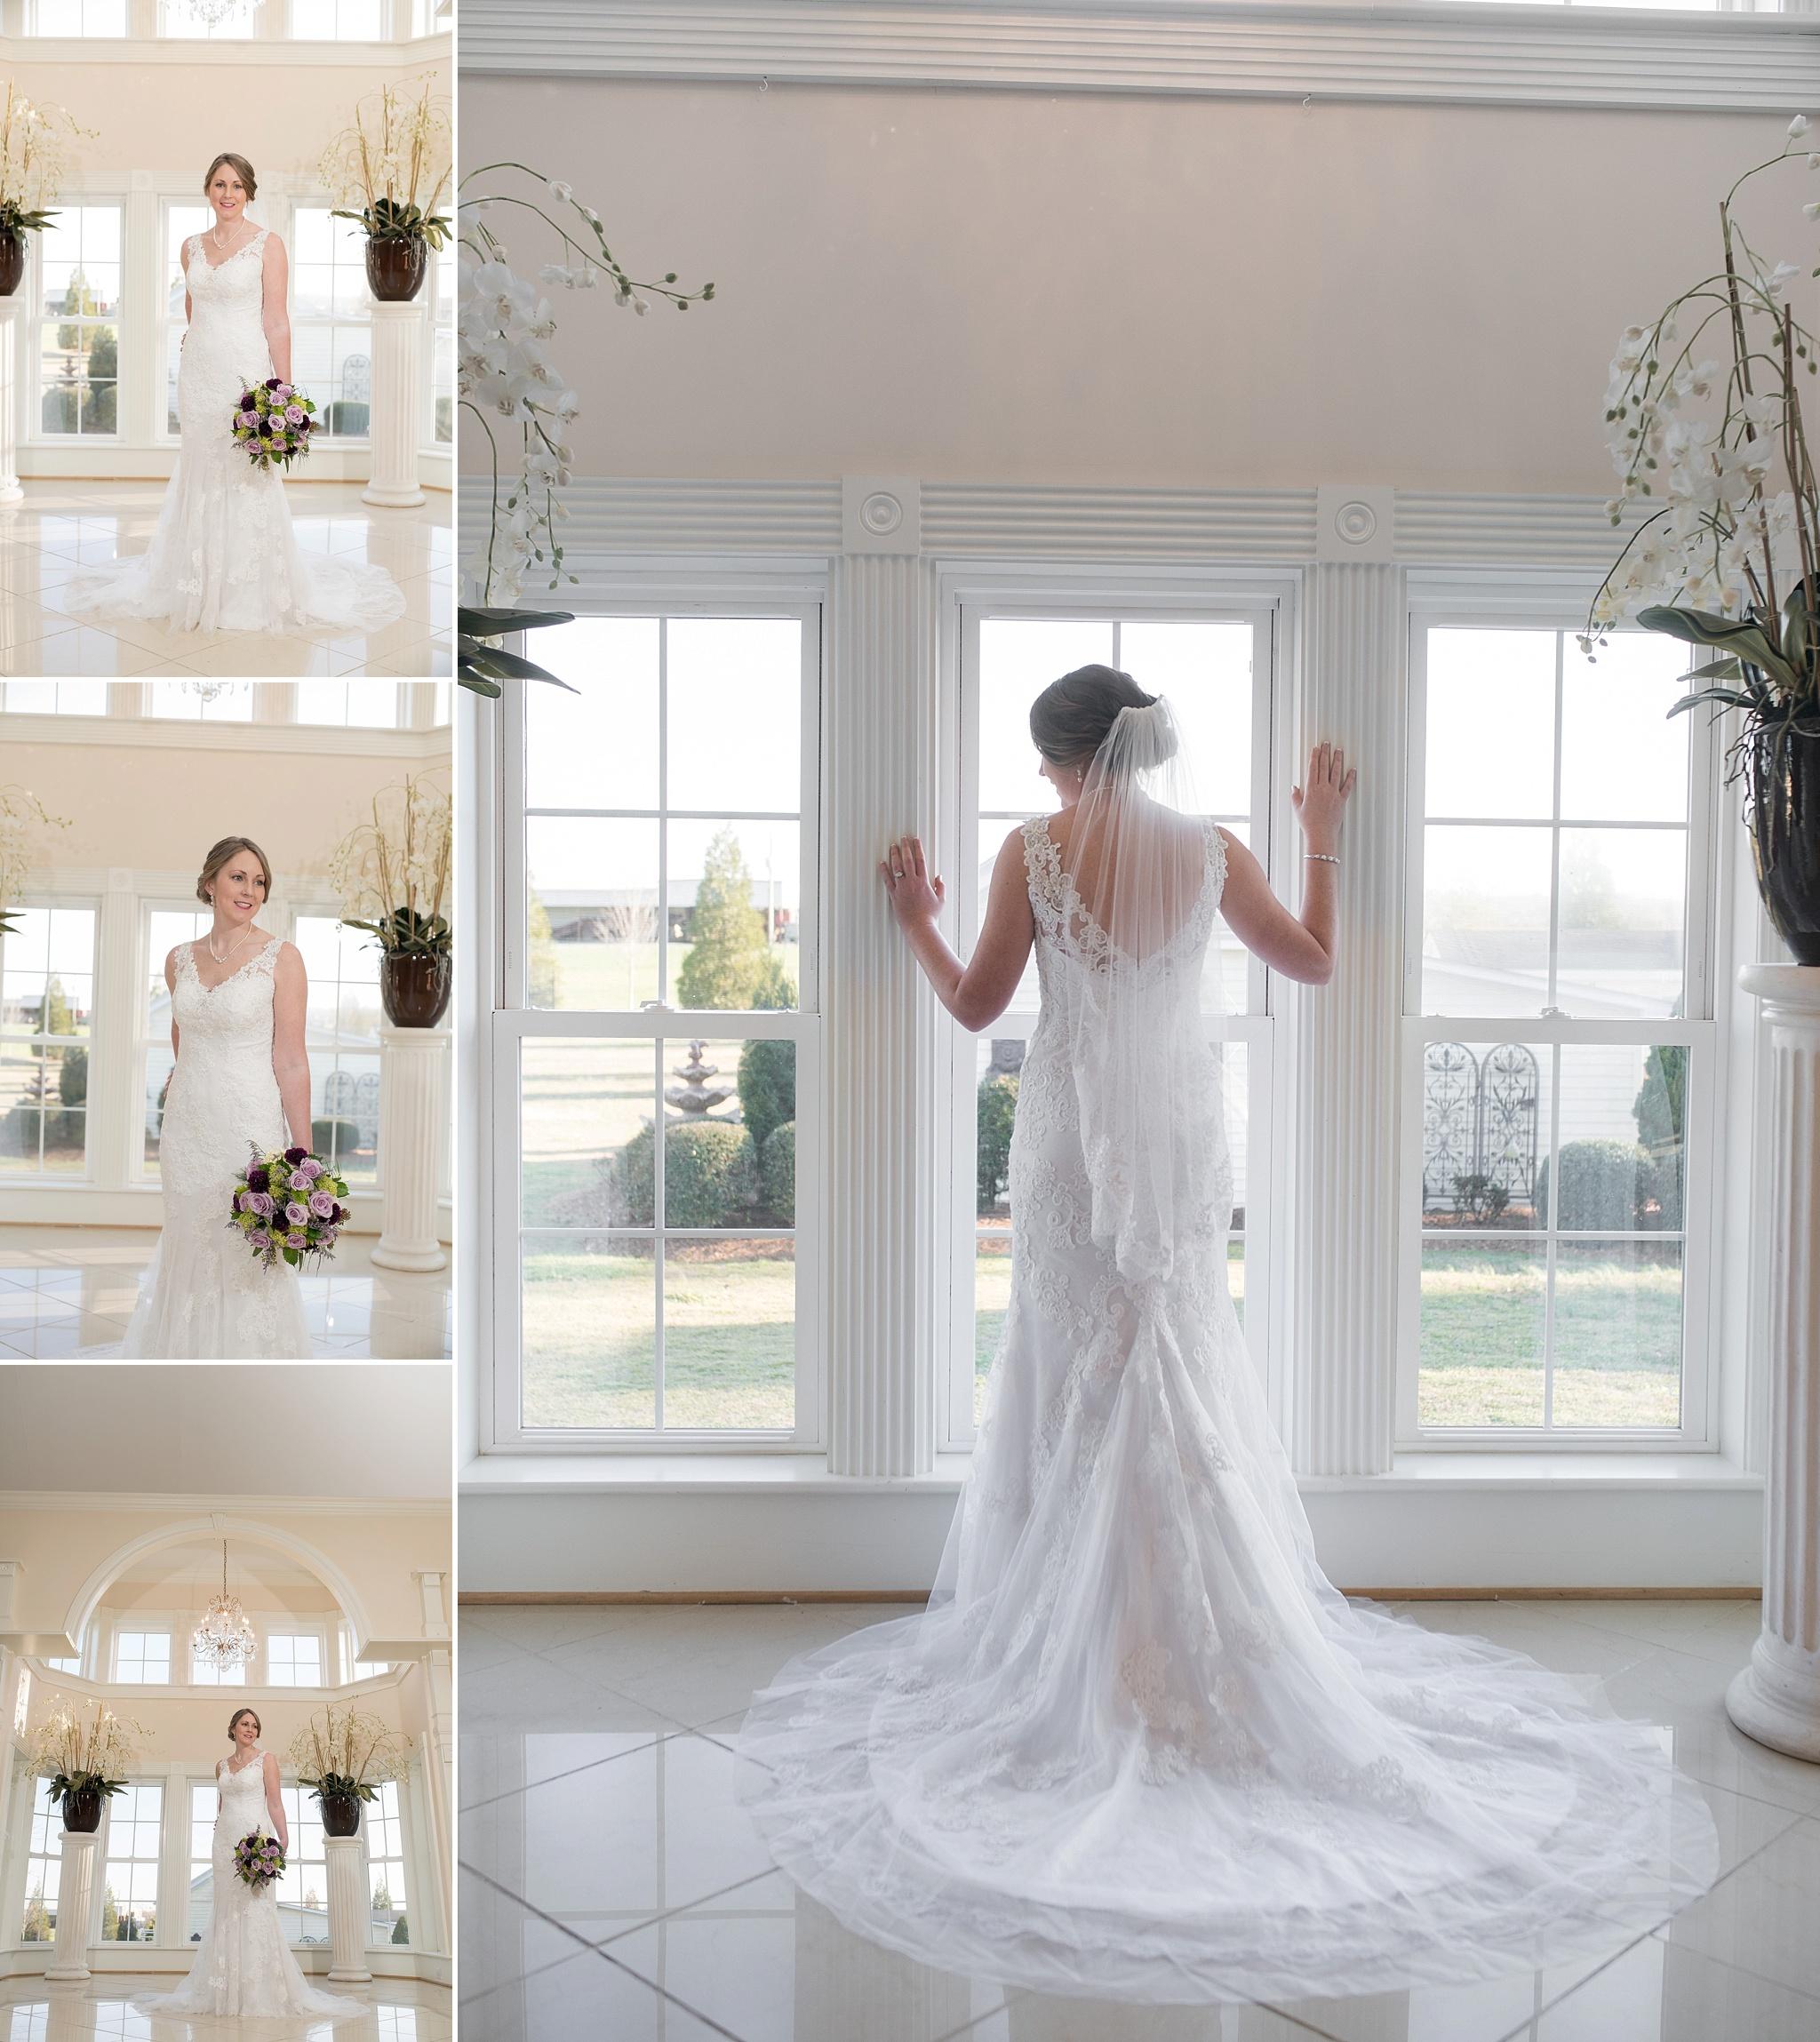 Yankee-Hall-Plantation-Wedding-NC-Photographer-0151.jpg